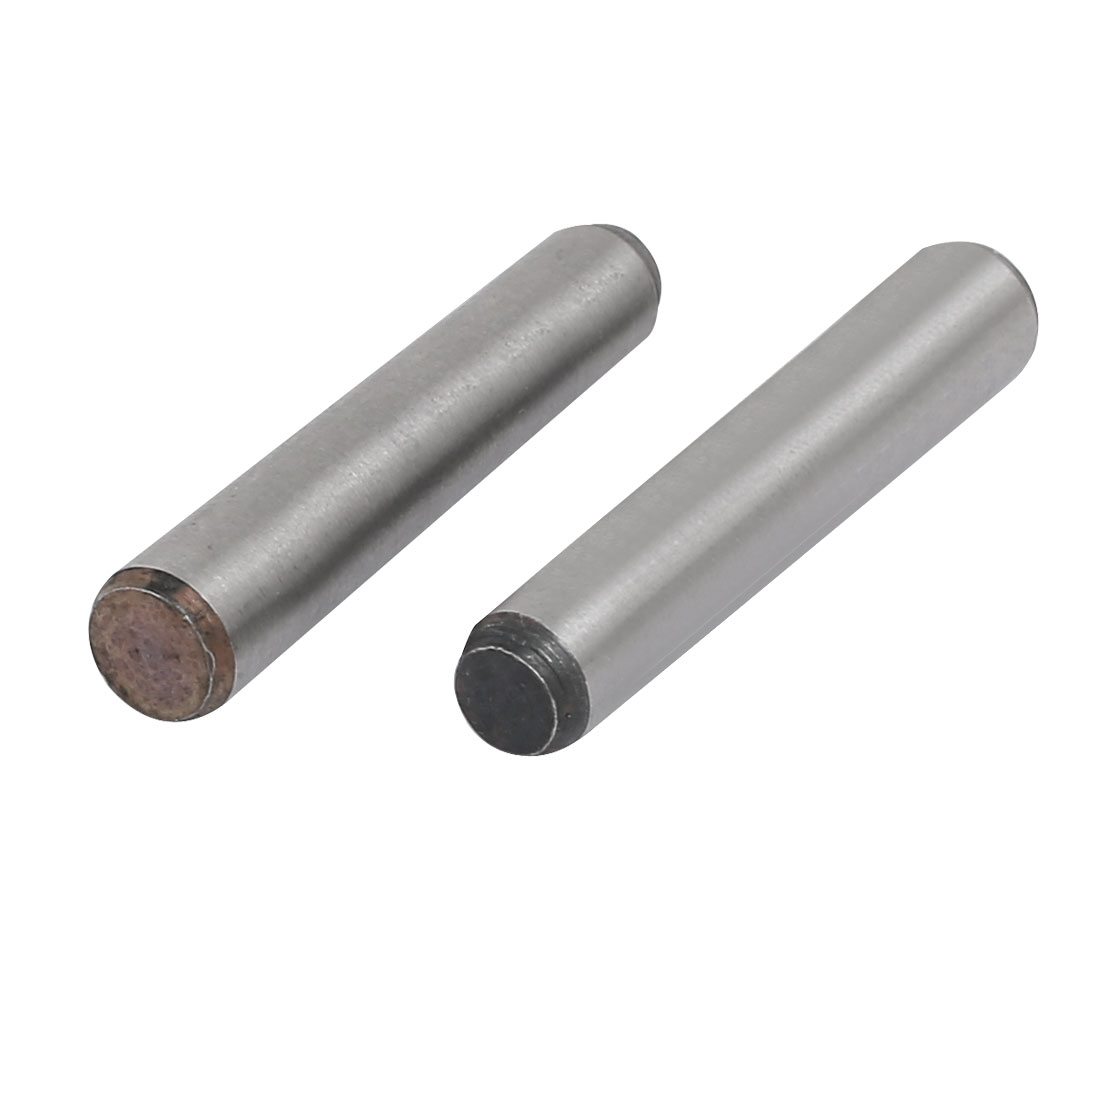 Carbon Steel GB117 35mm Length 6mm Small End Diameter Taper Pin 12pcs - image 1 de 2